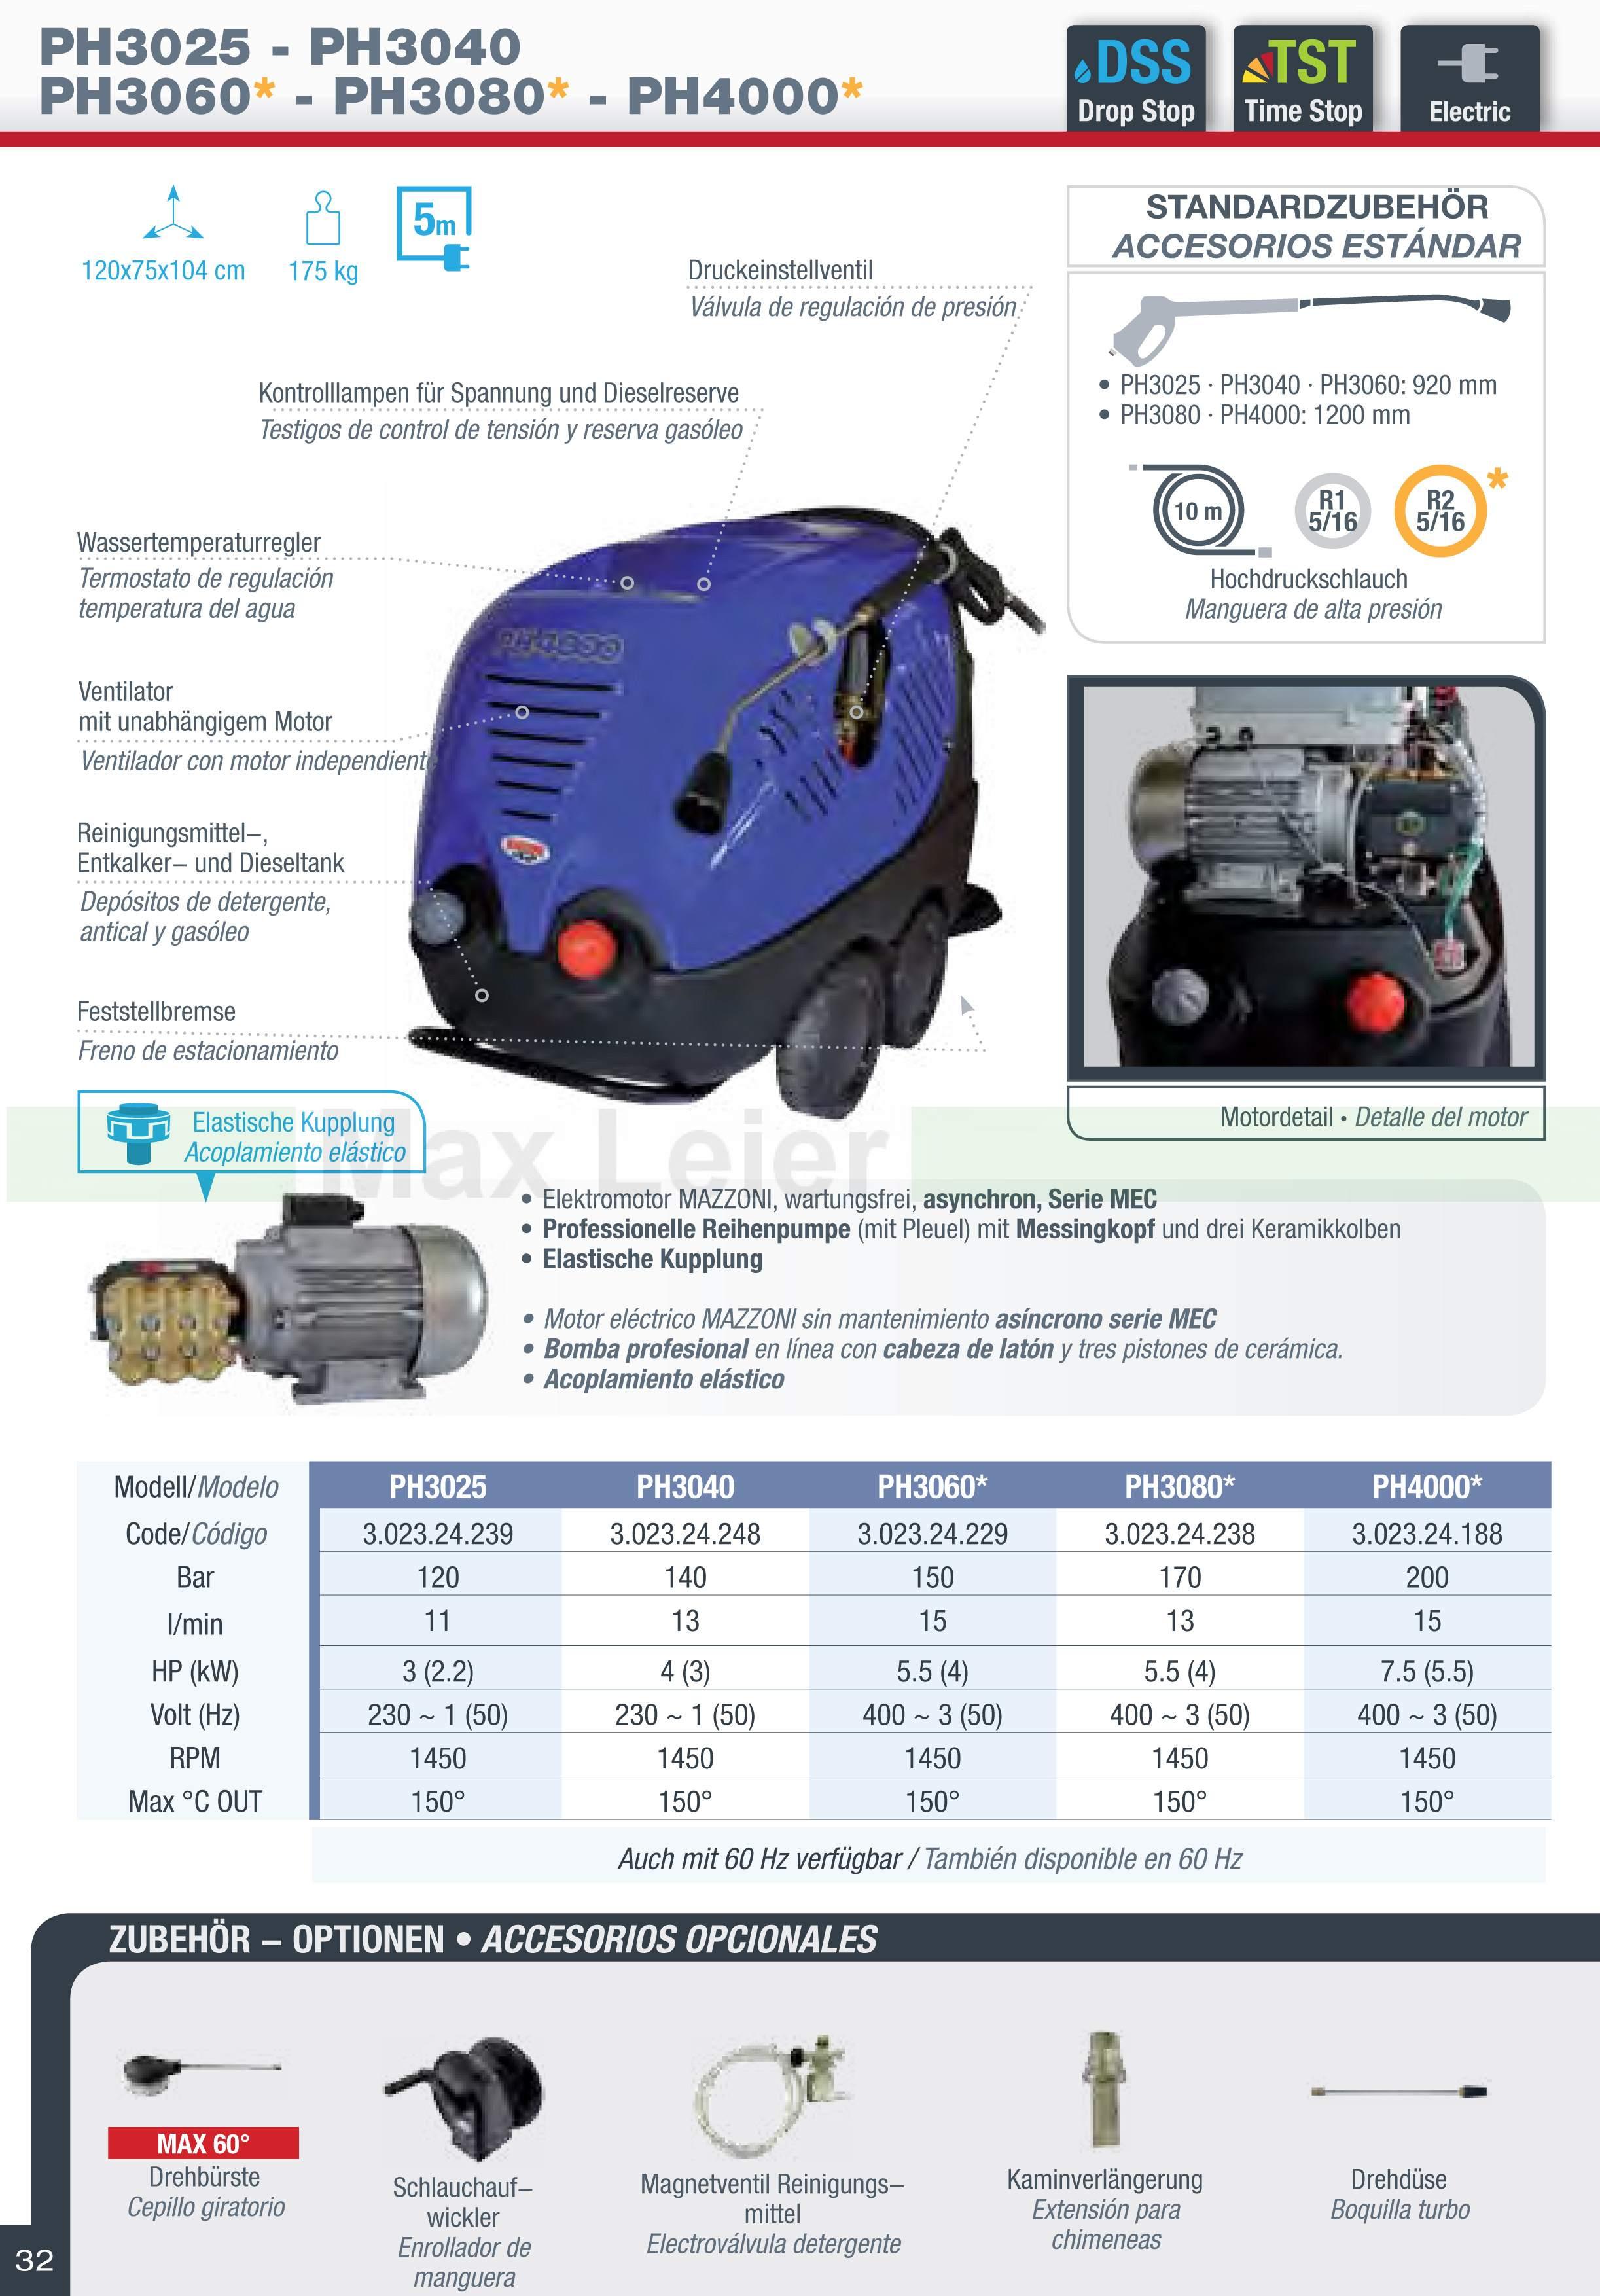 S32-Mazzoni-PH3025-PH3040-PH3060-PH3080-PH4000